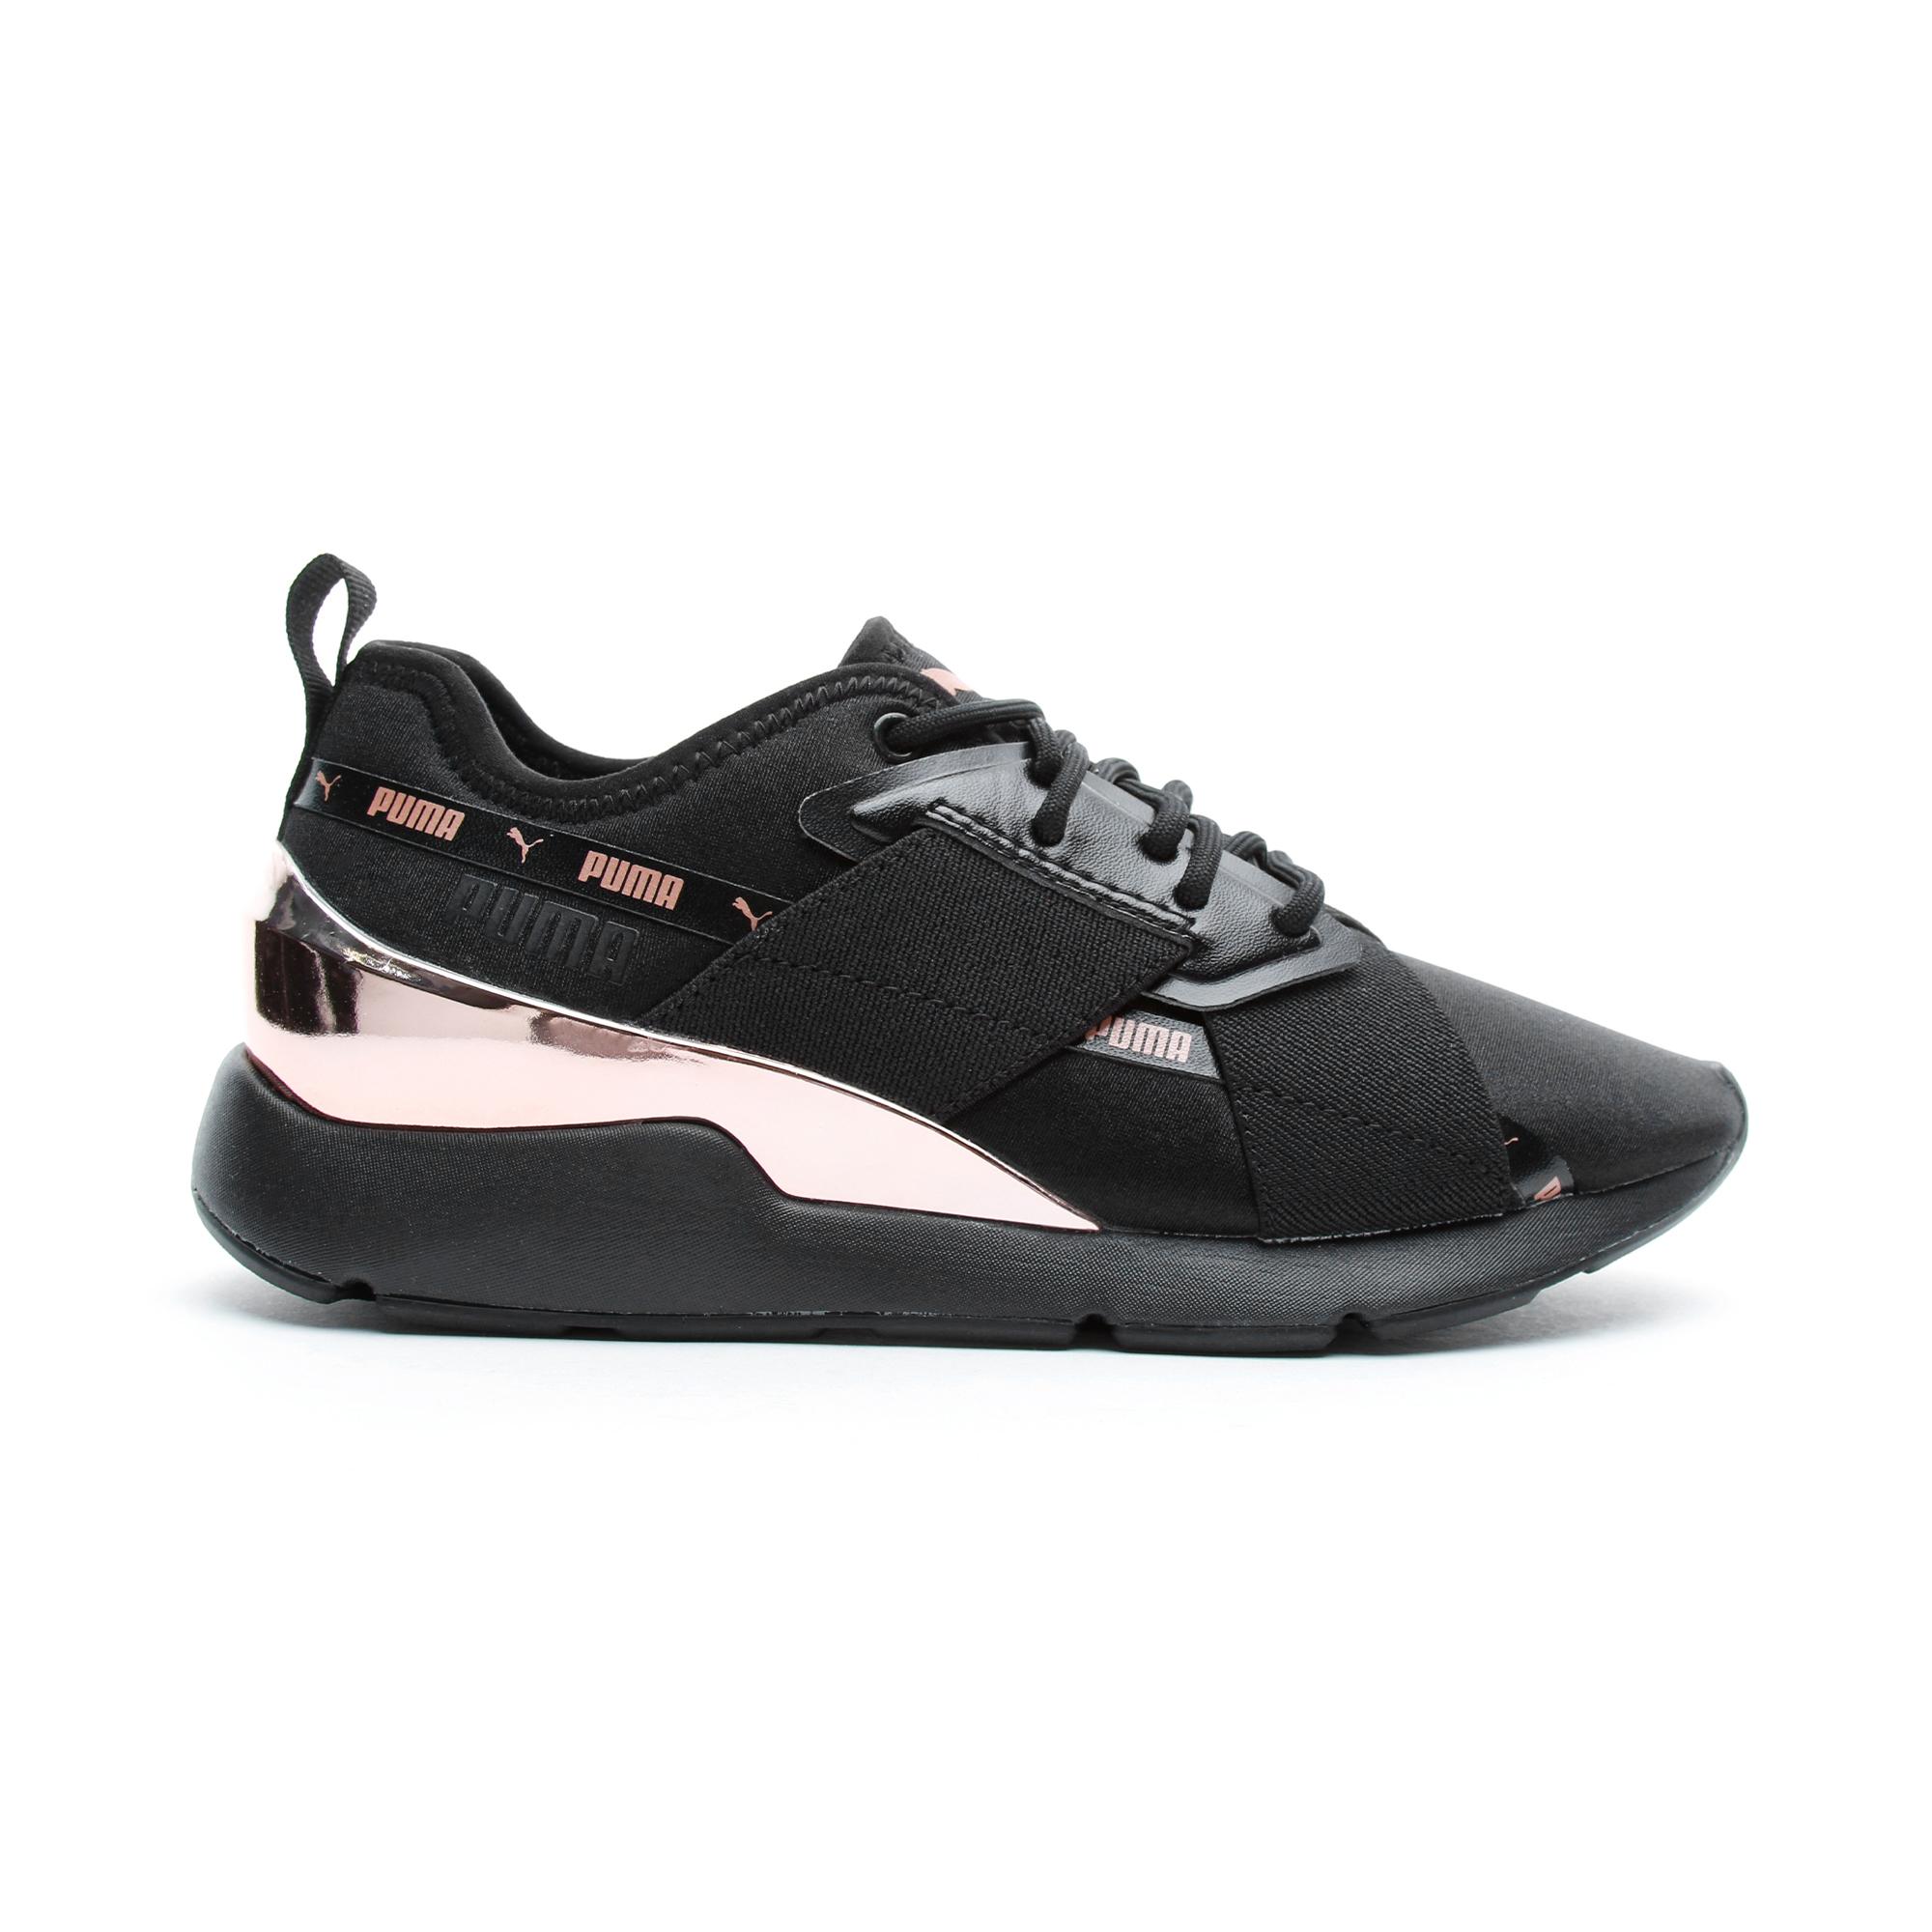 Puma Muse X-2 Metallic Kadın Siyah Spor Ayakkabı